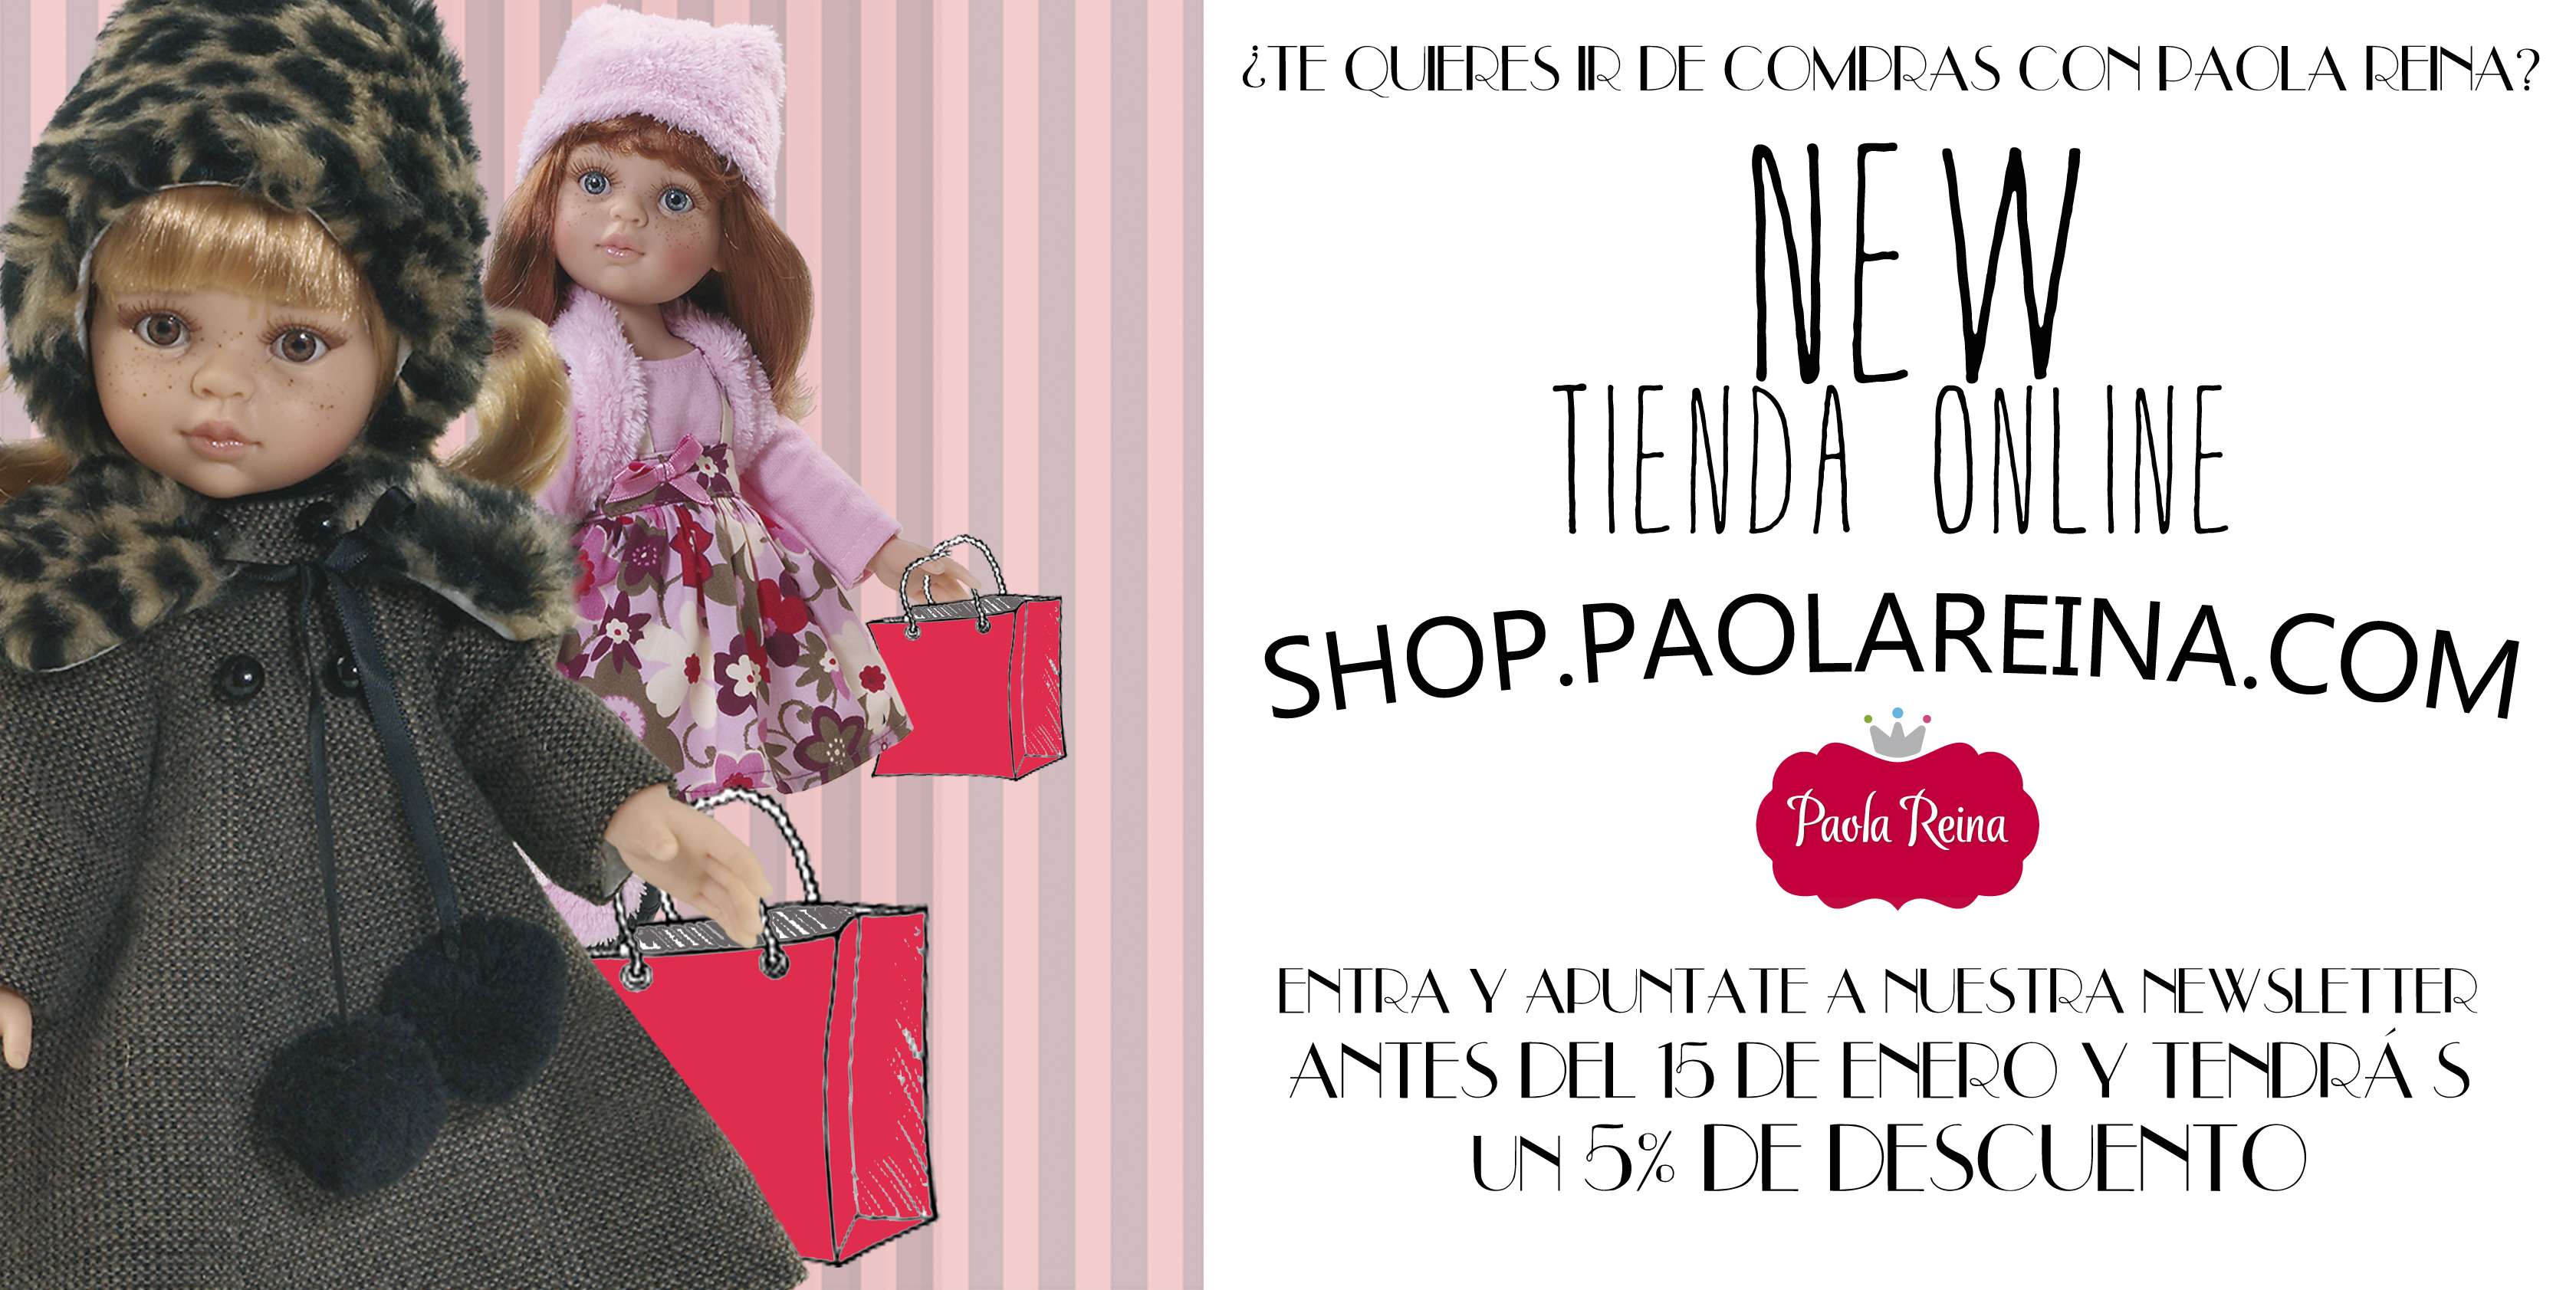 031213Paola_reina_tienda_online